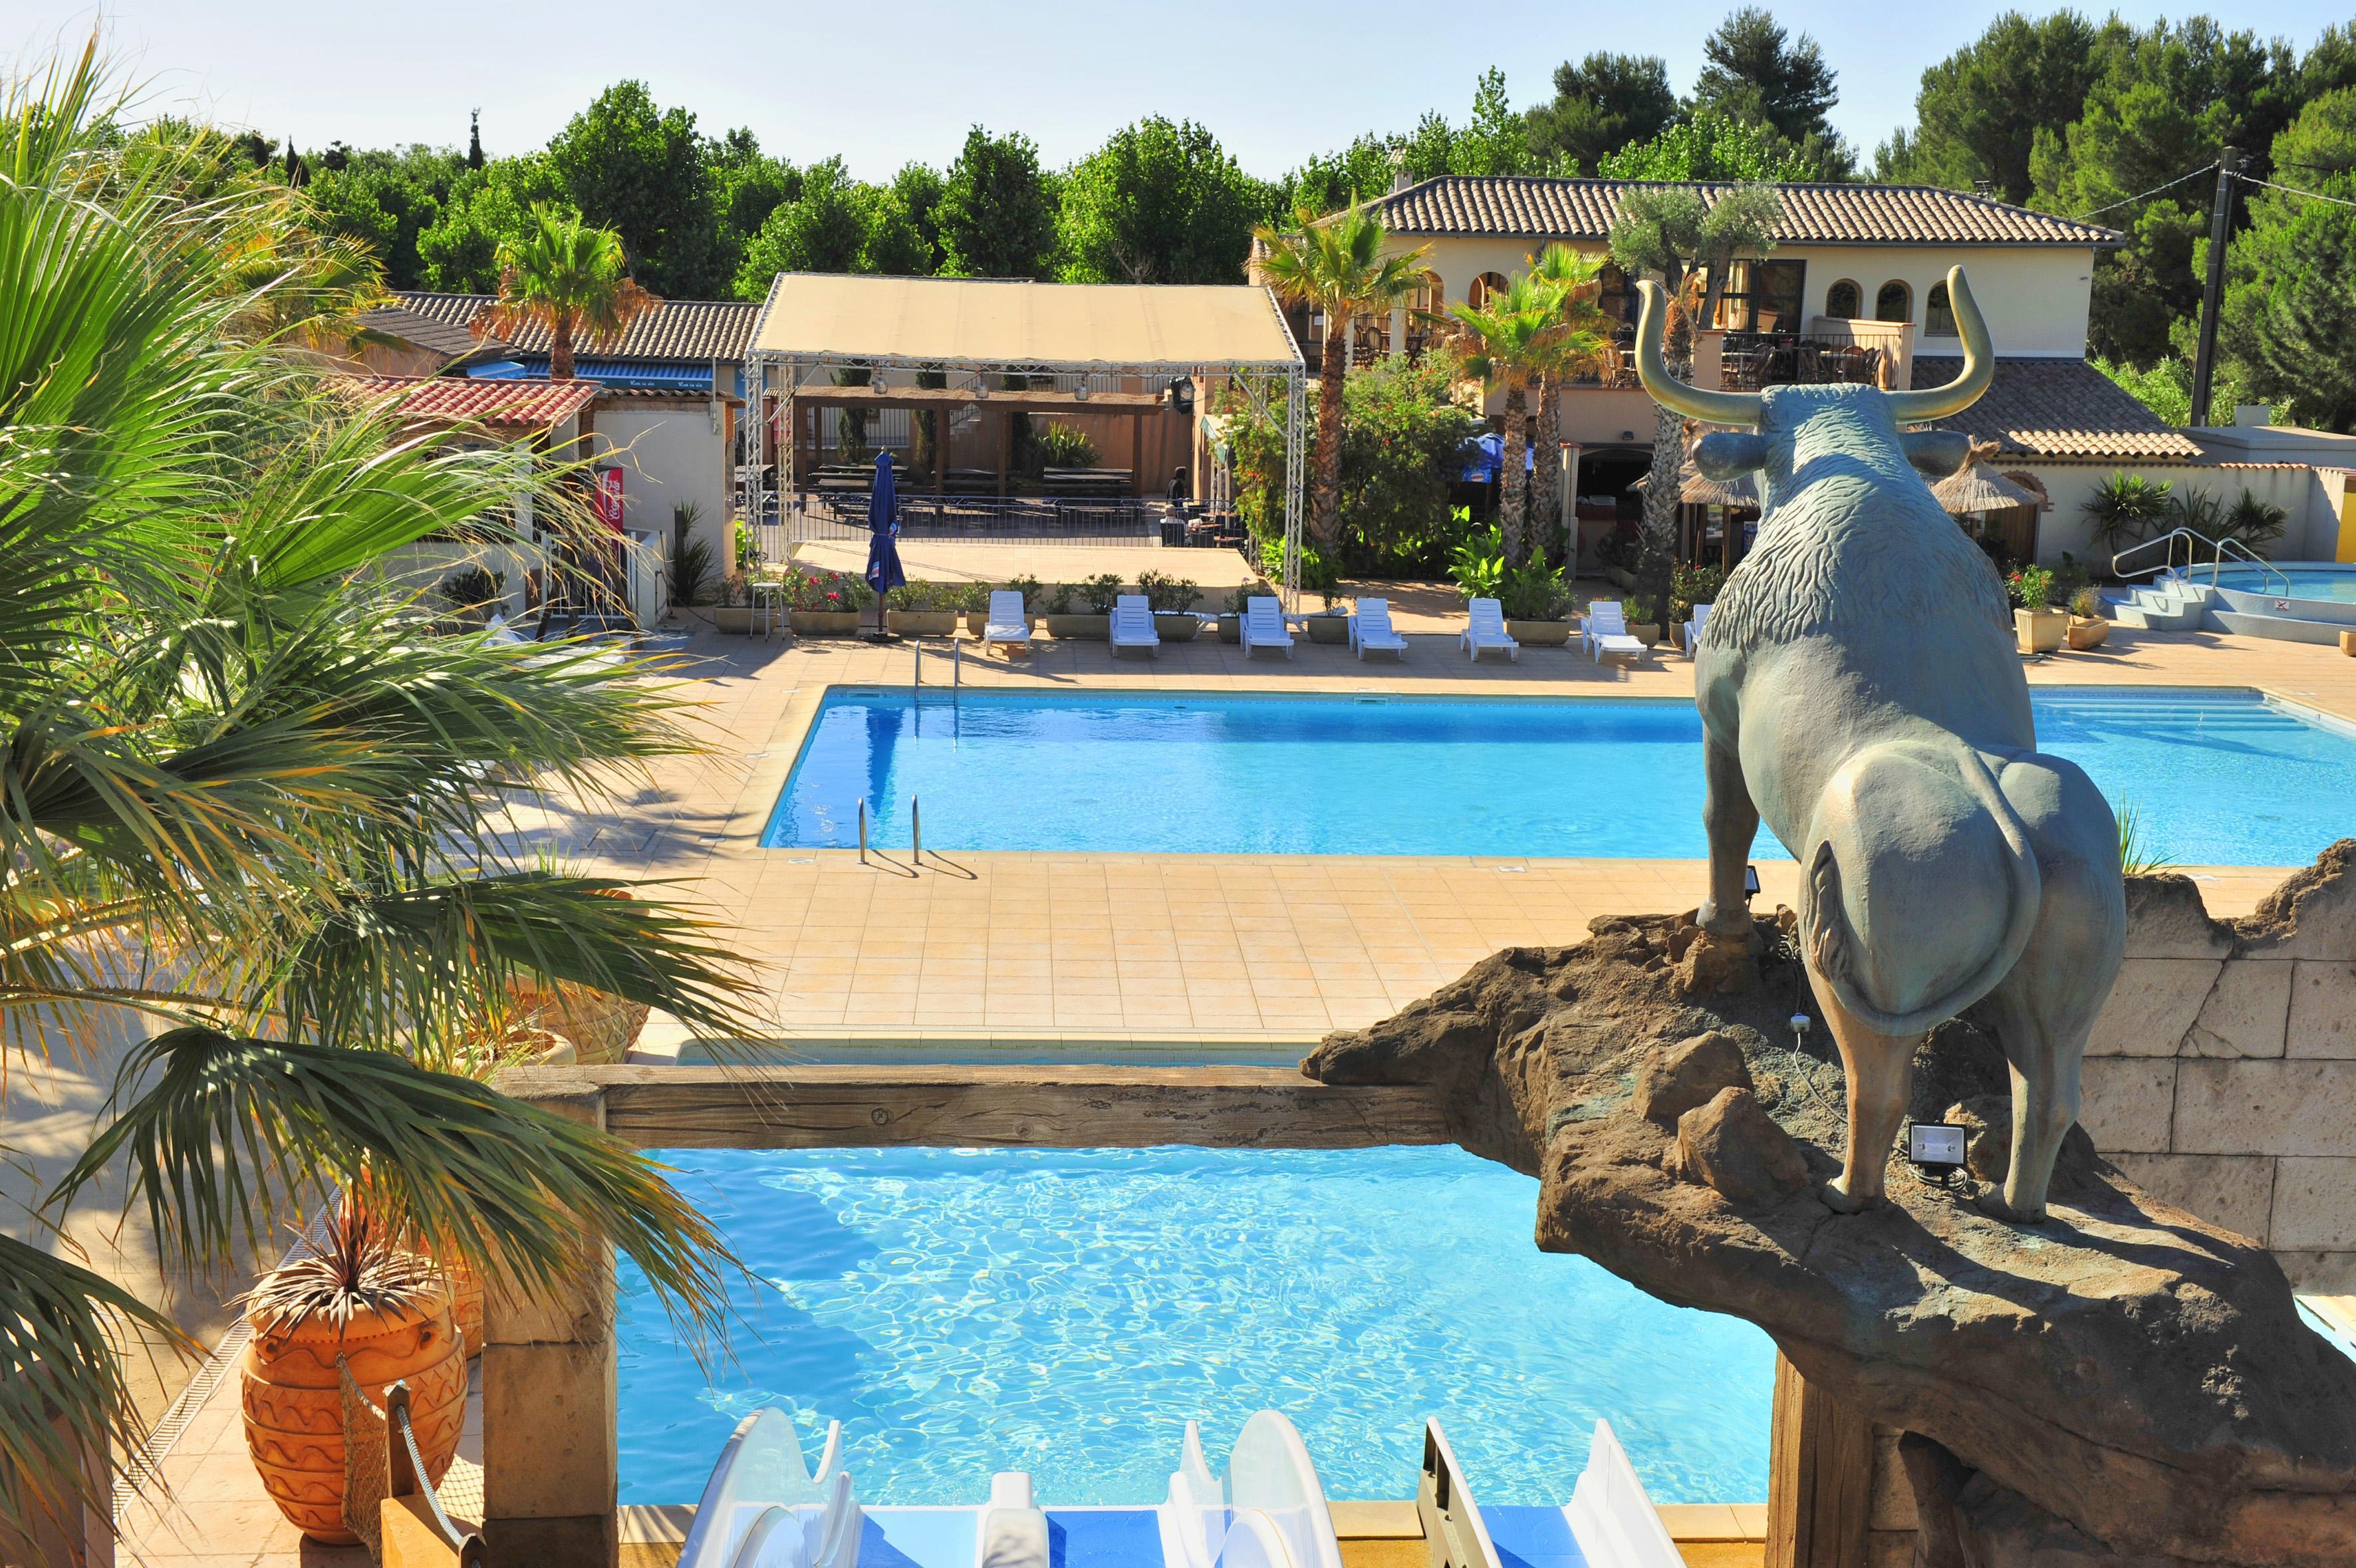 Camping Yelloh! Village Mer et Soleil, Agde, Hérault